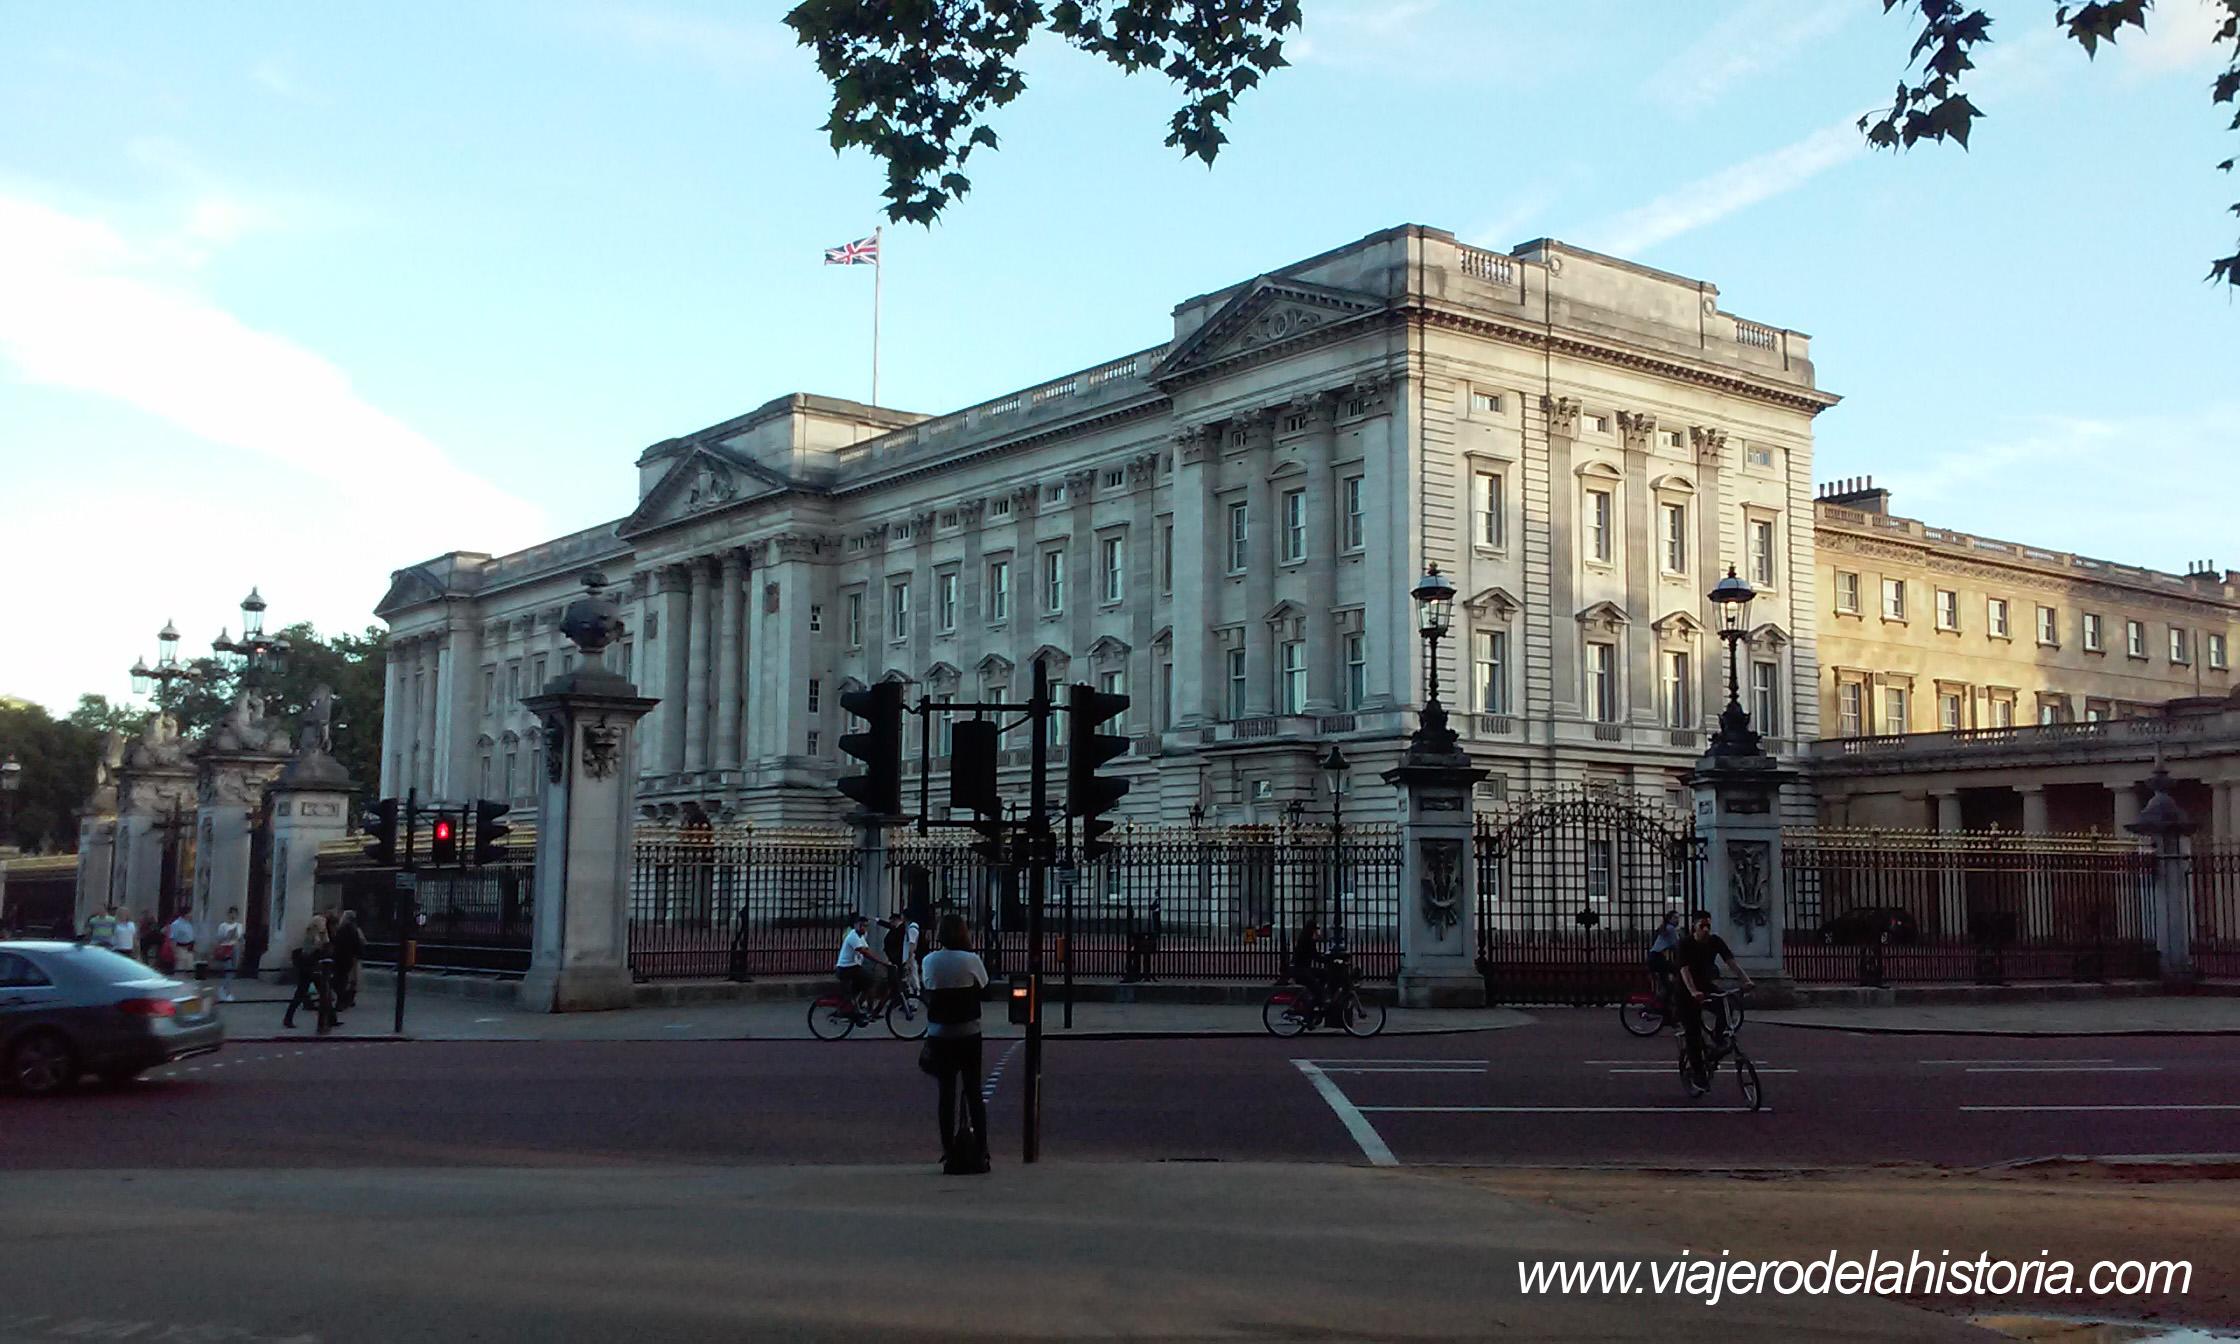 imagen de Buckingham Palace, Londres, Inglaterra